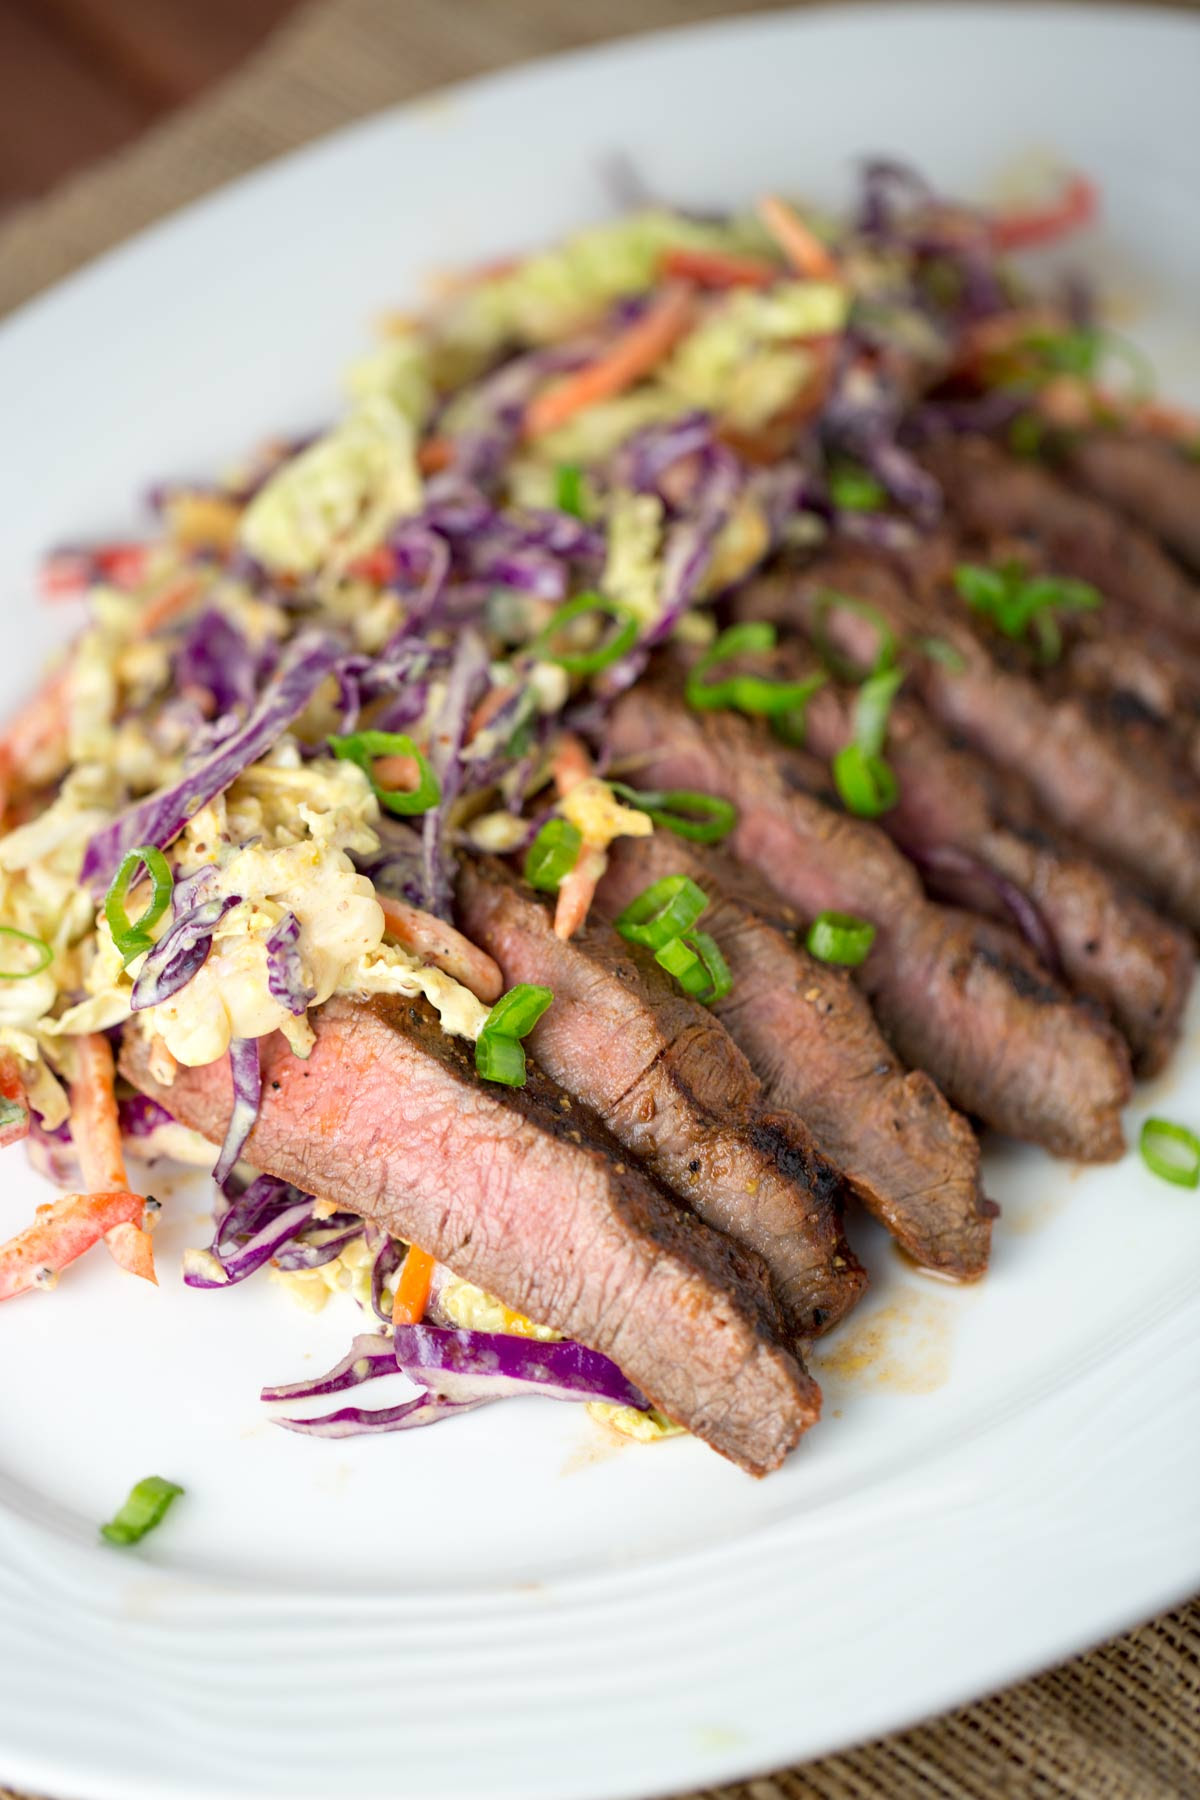 Flatiron Steak Recipe Roundup - Meathacker